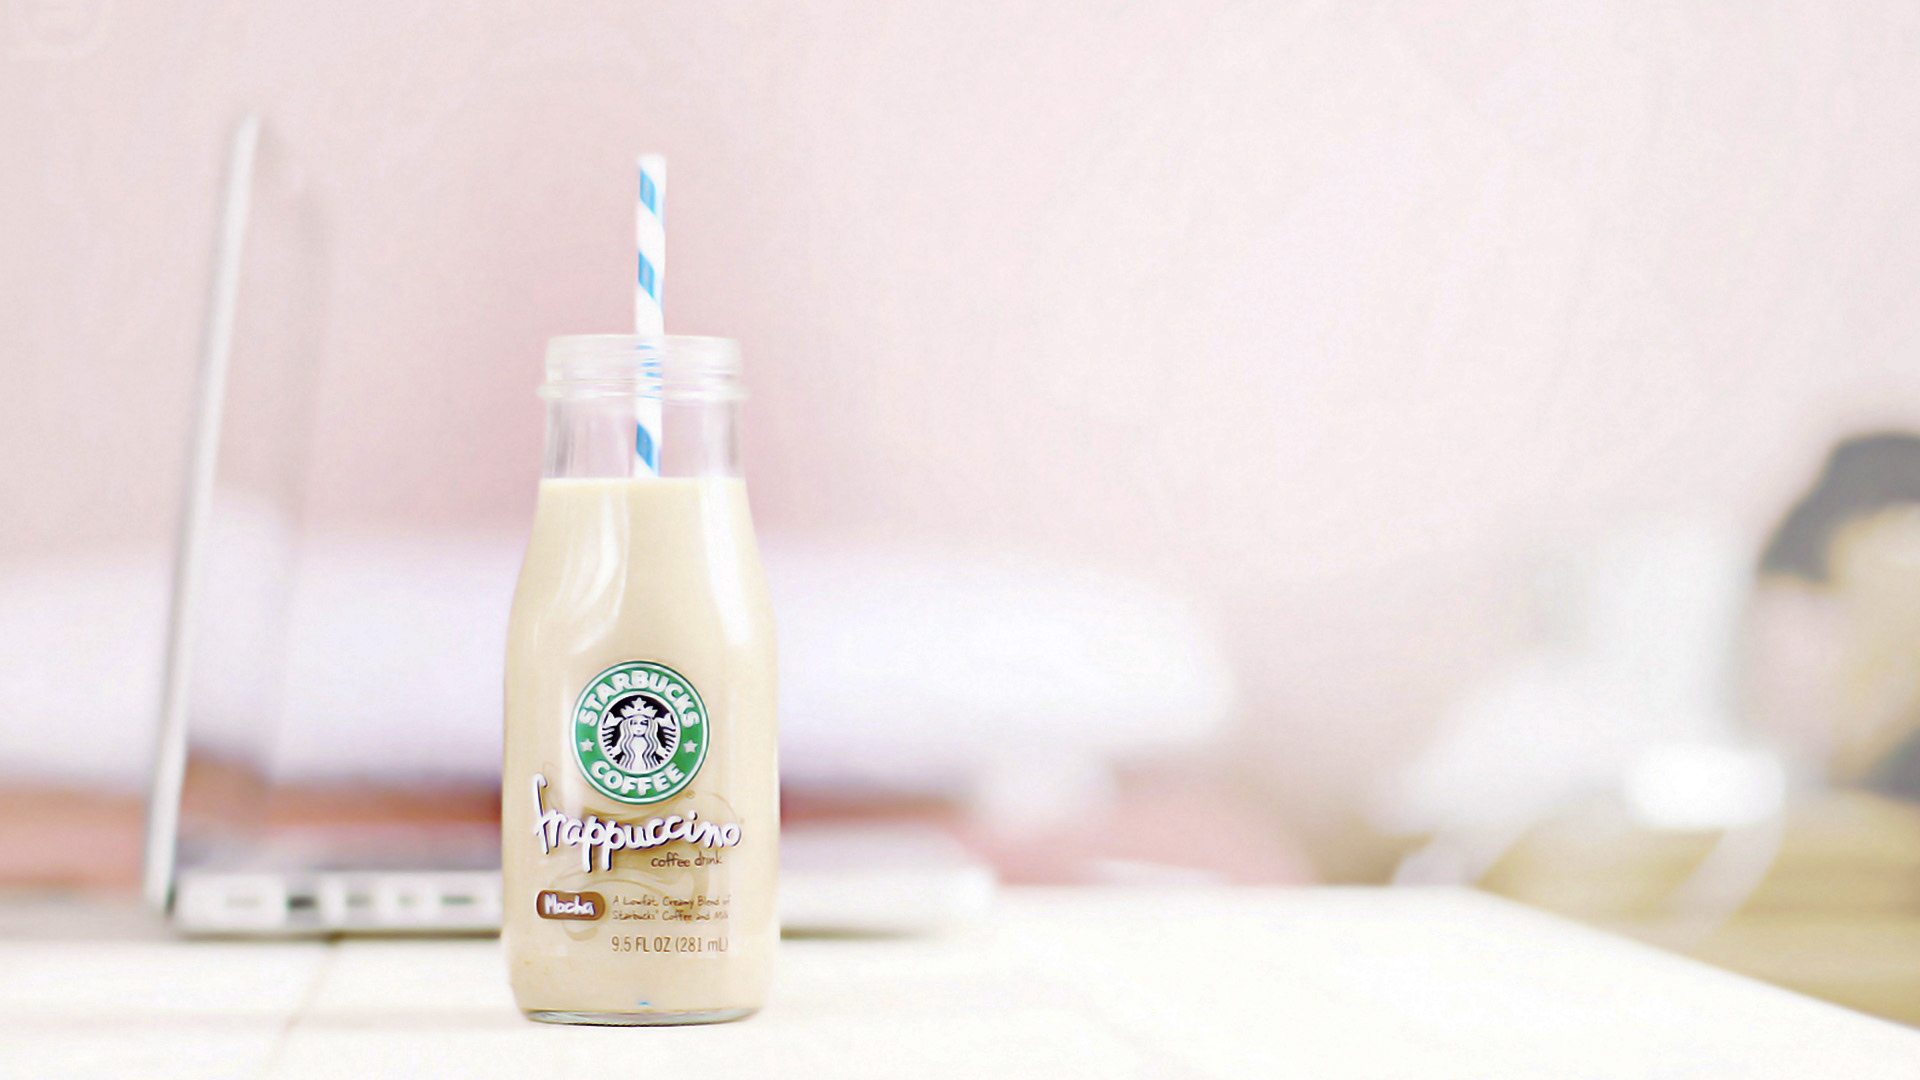 Starbucks Drink Desktop Wallpaper 53515 1920x1080 px